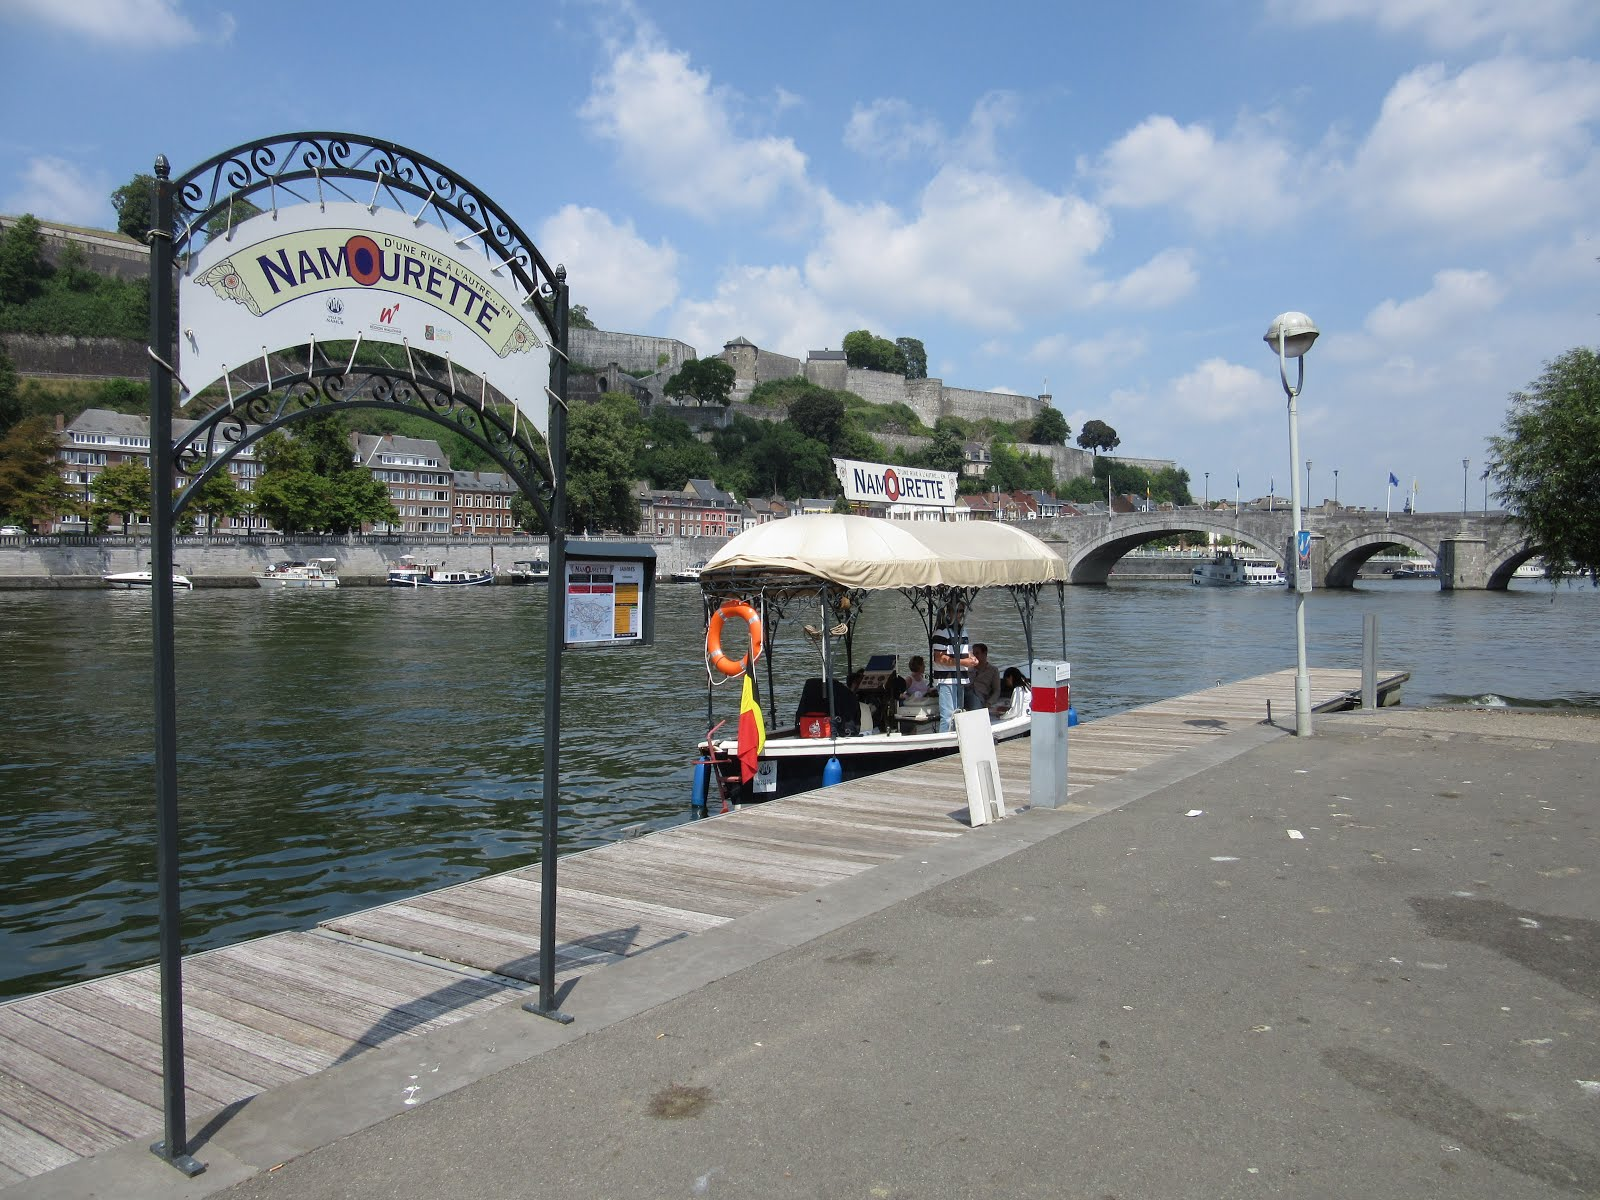 Stadt Namur